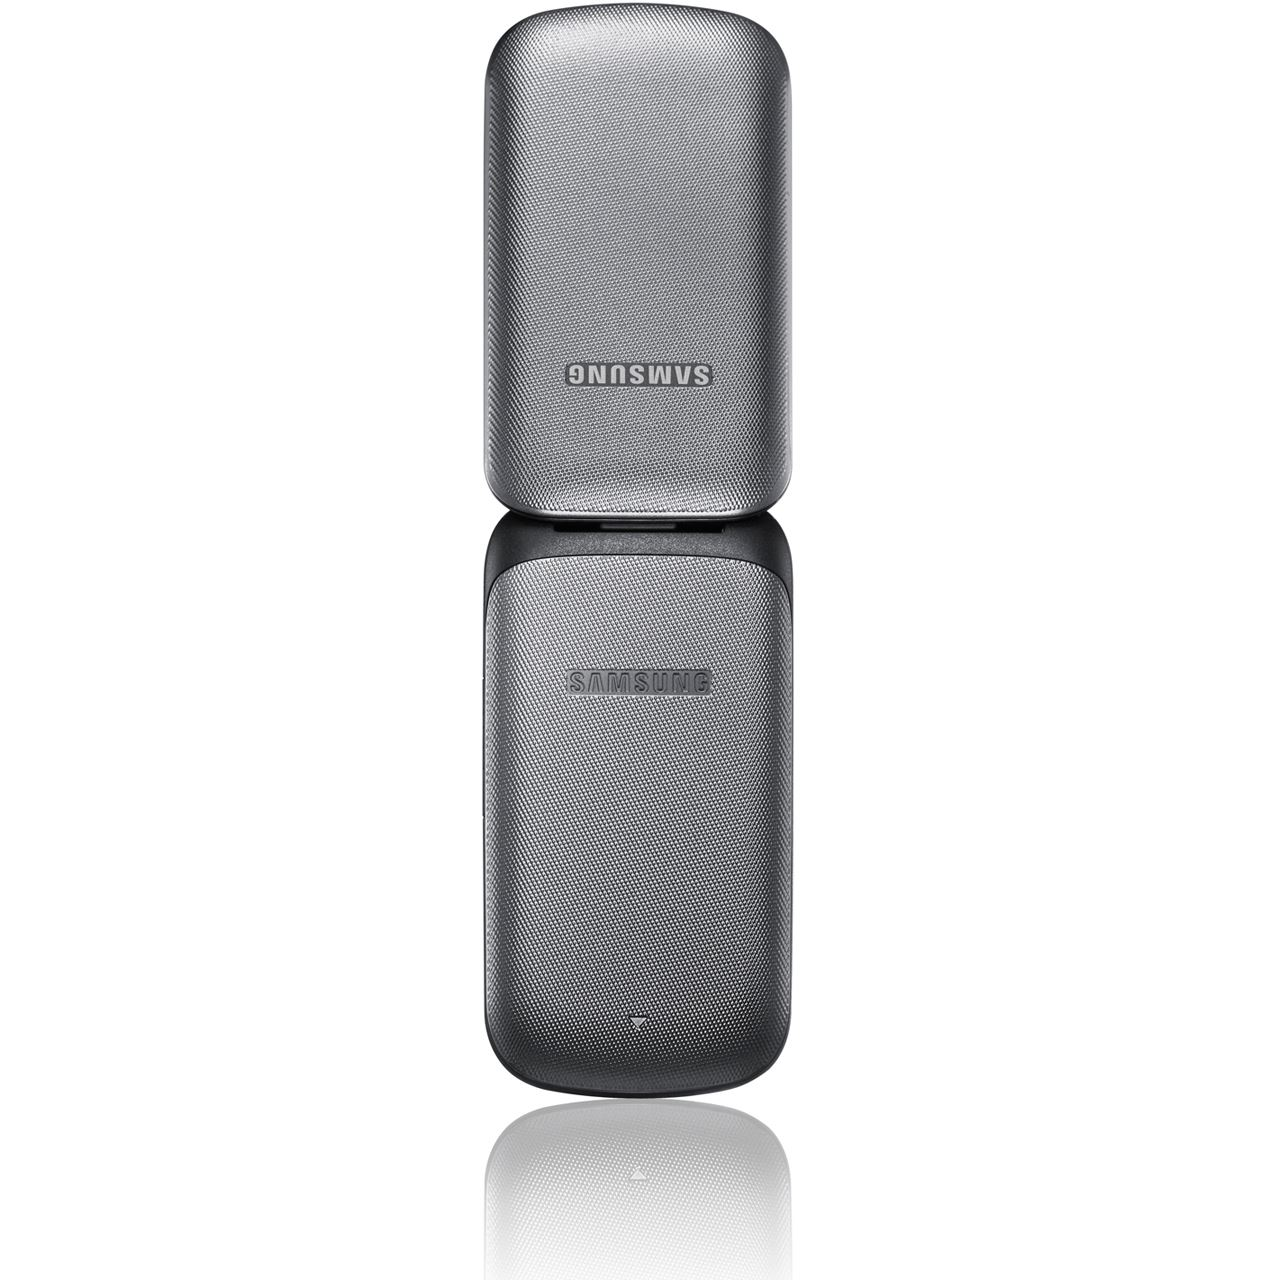 Samsung E1190 Grau Telekom Handys Ohne Vertrag Mindfactoryde